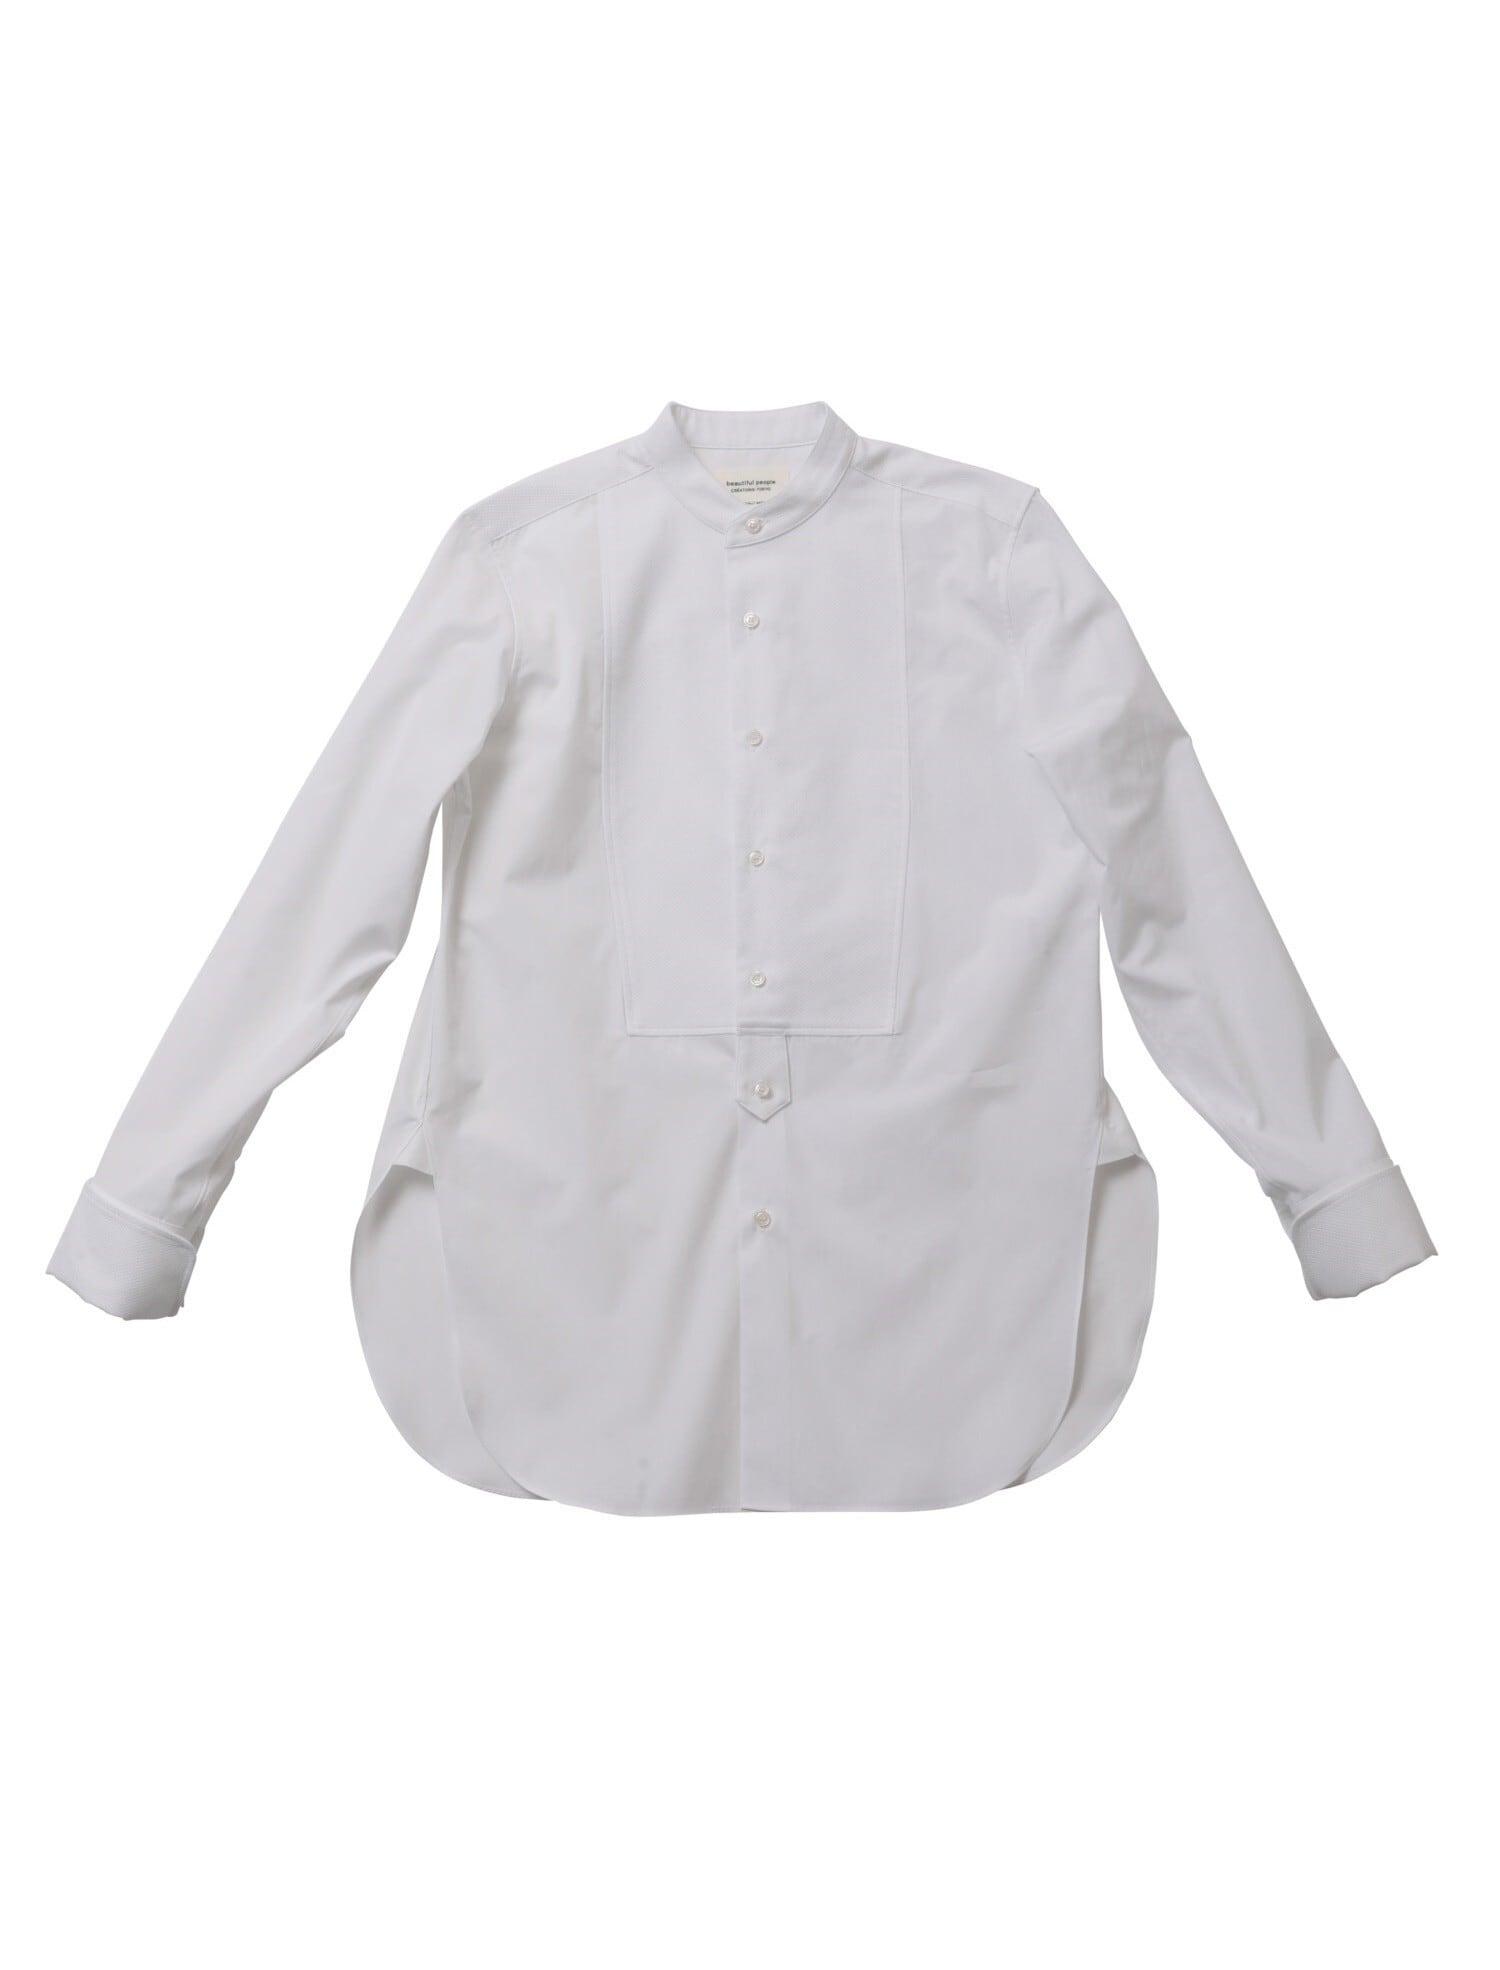 【beautiful people】ギャツビー シャーティング THE/aタキシードシャツ 1000106411